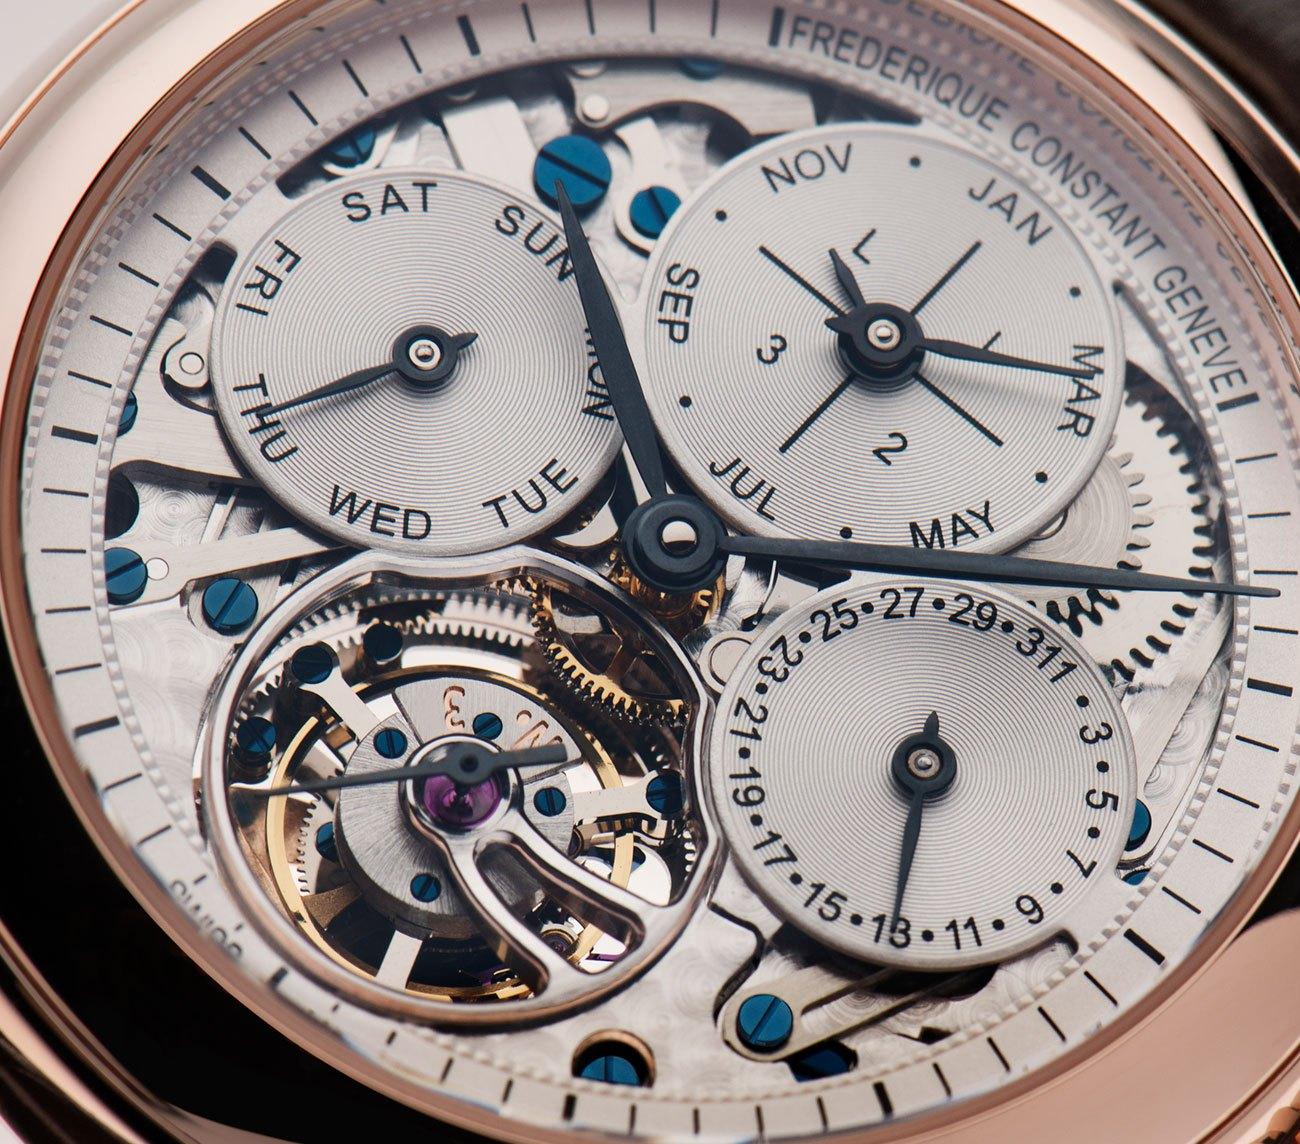 frederique-constant-perpetual-calendar-tourbillon-manufacture-9.jpg